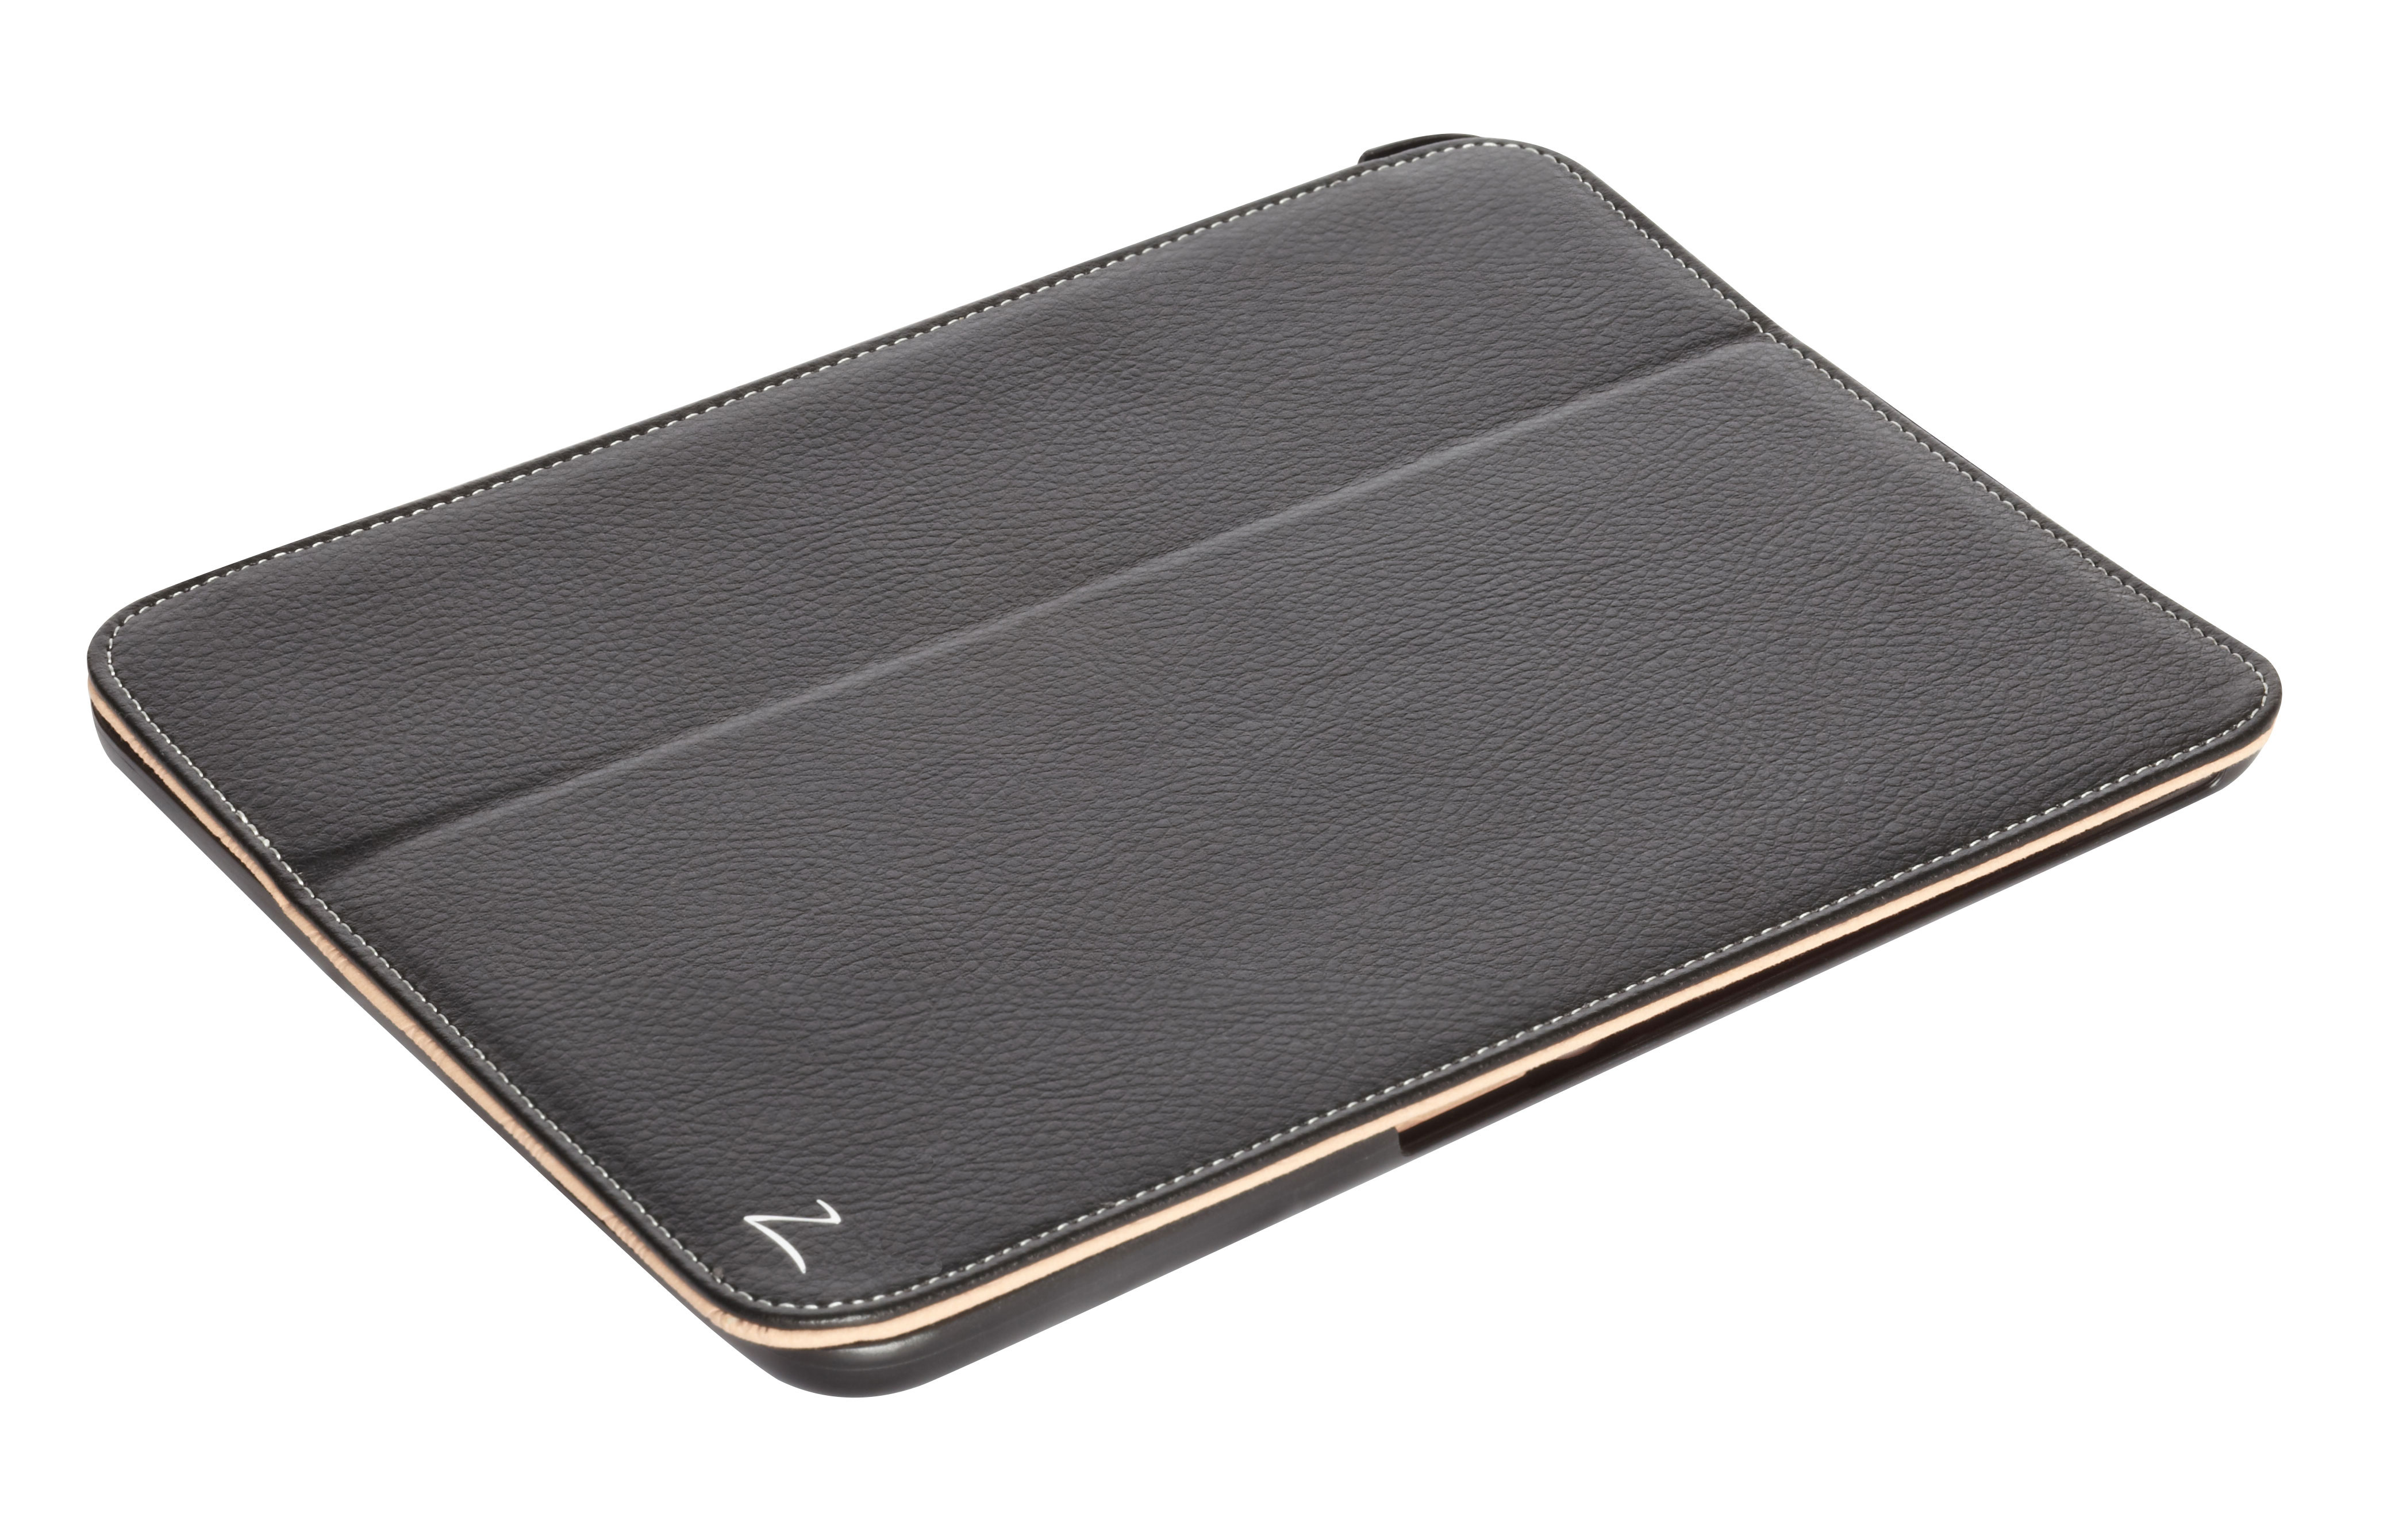 ����� LaZarr Book Cover ��� Samsung Galaxy Tab 3 10.1 GT-P5200/P5210 Black